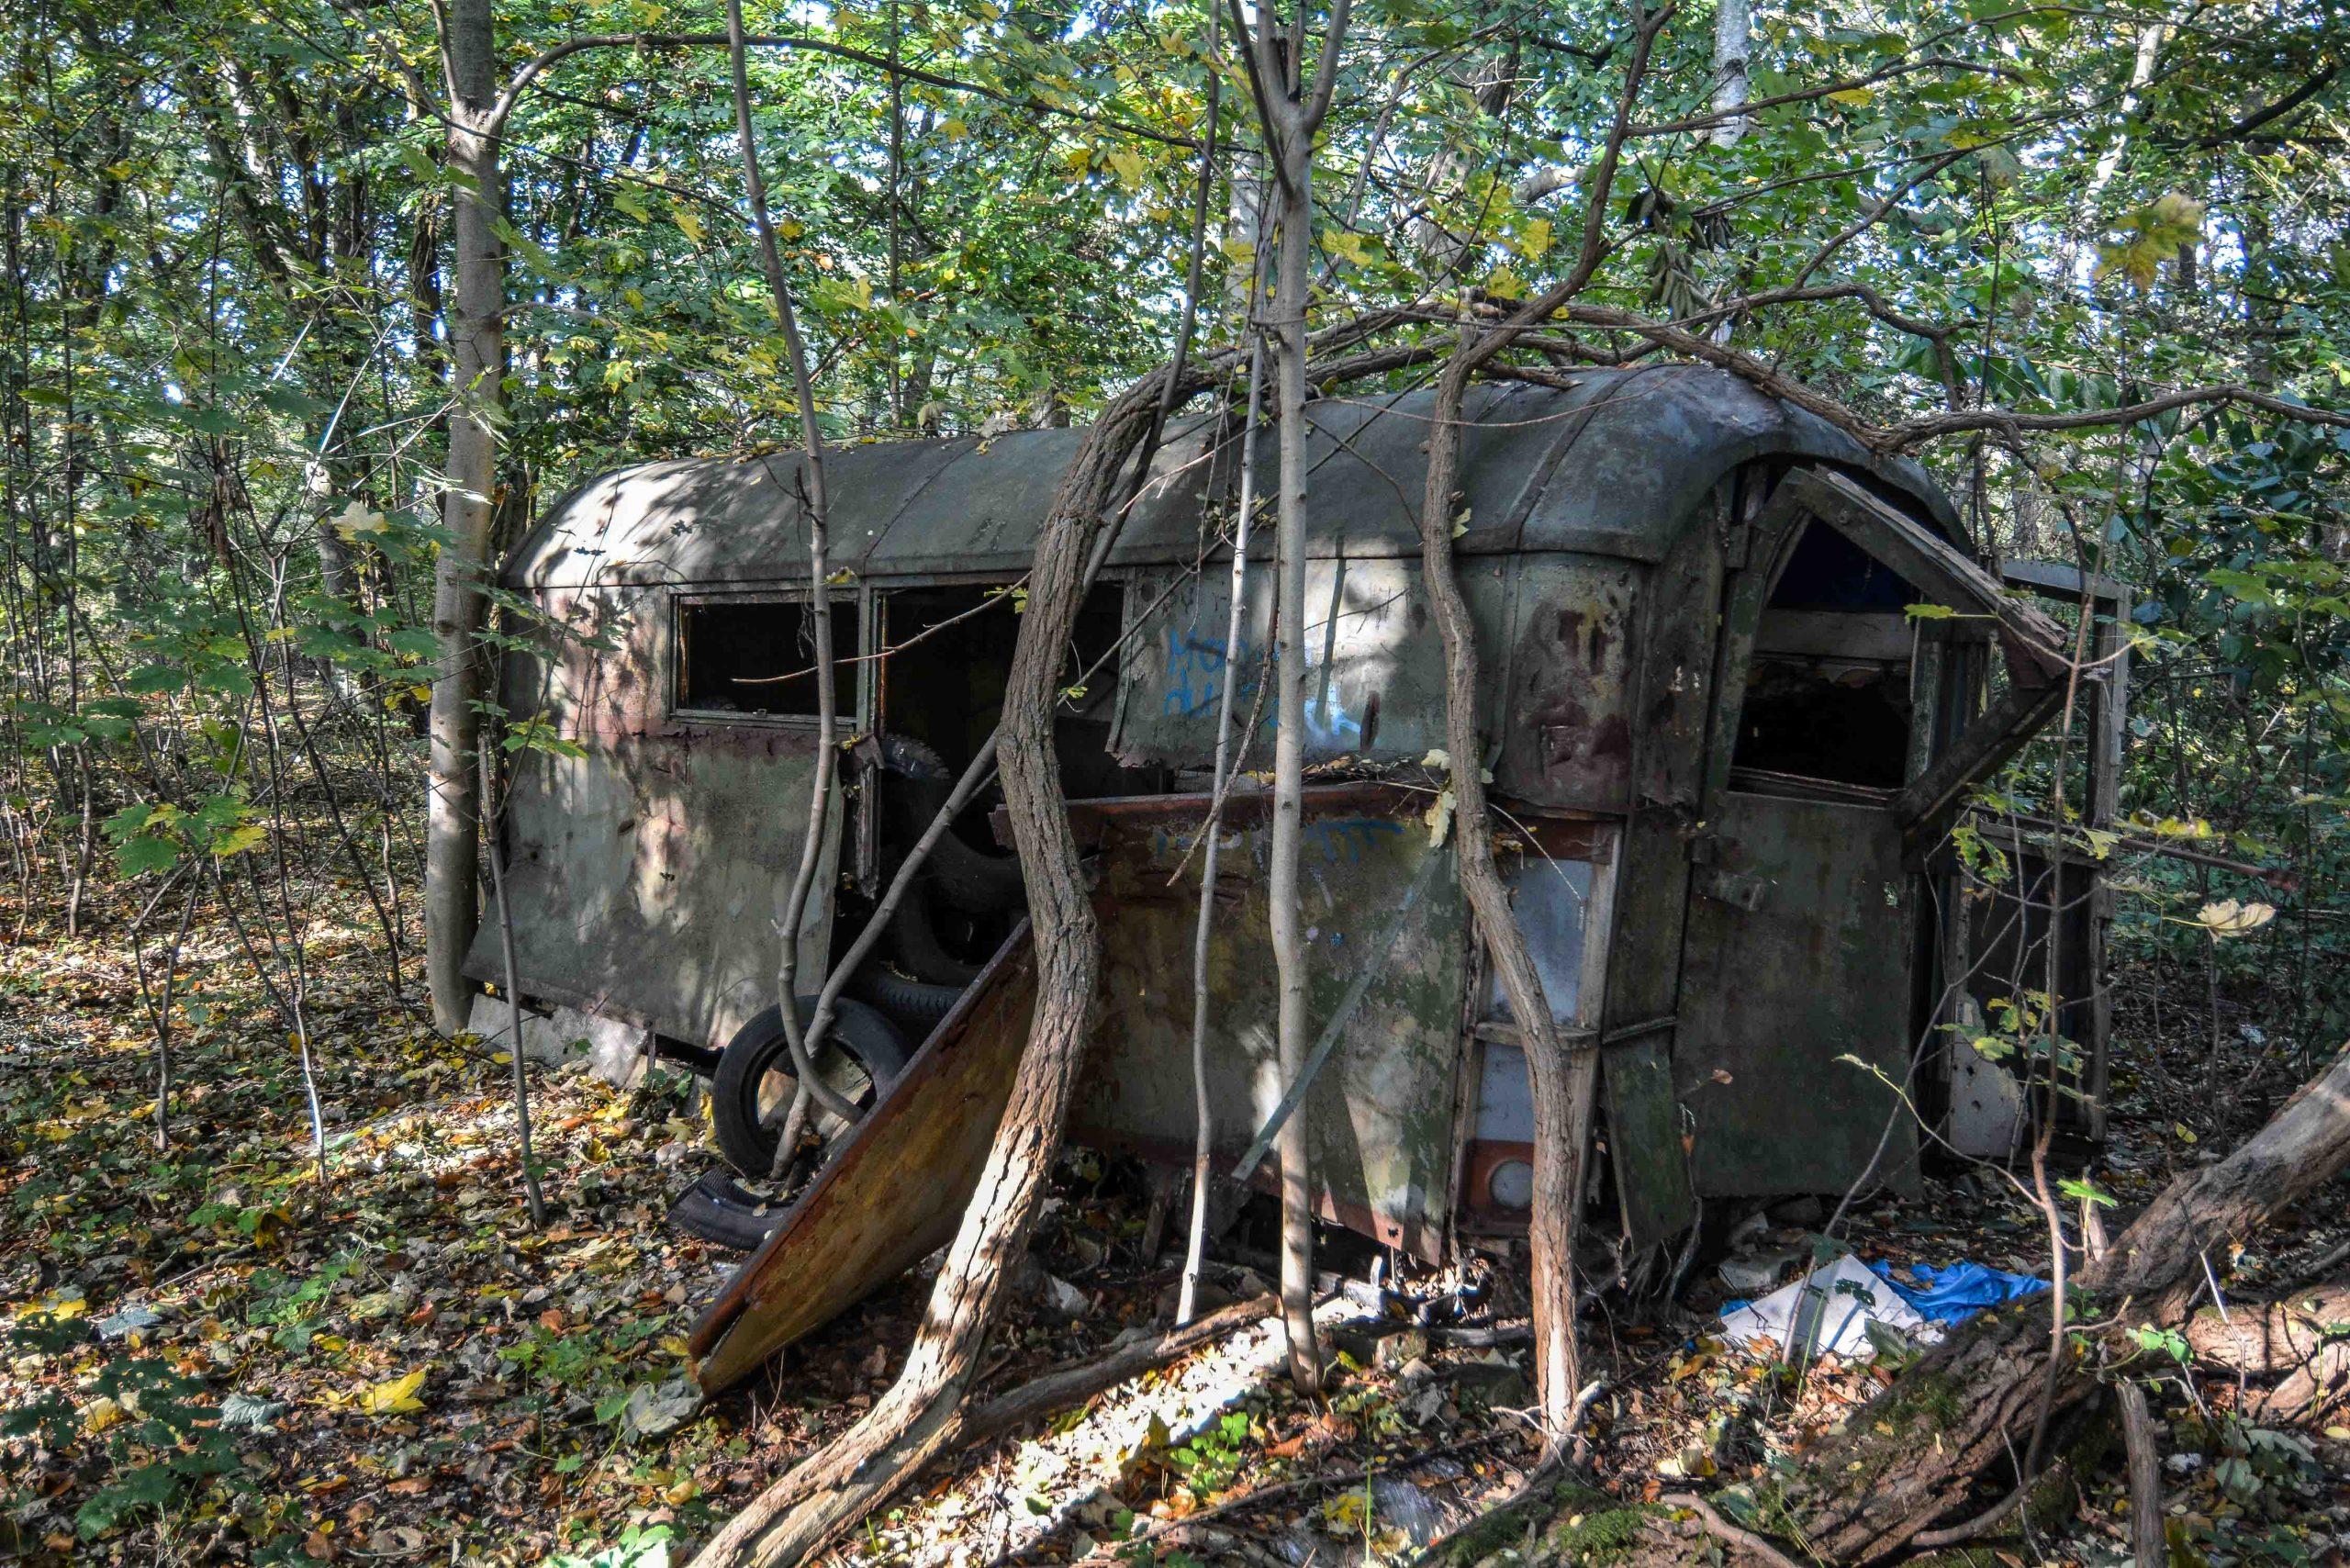 soviet camper van flugplatz oranienburg urbex abandoned lost places brandenburg